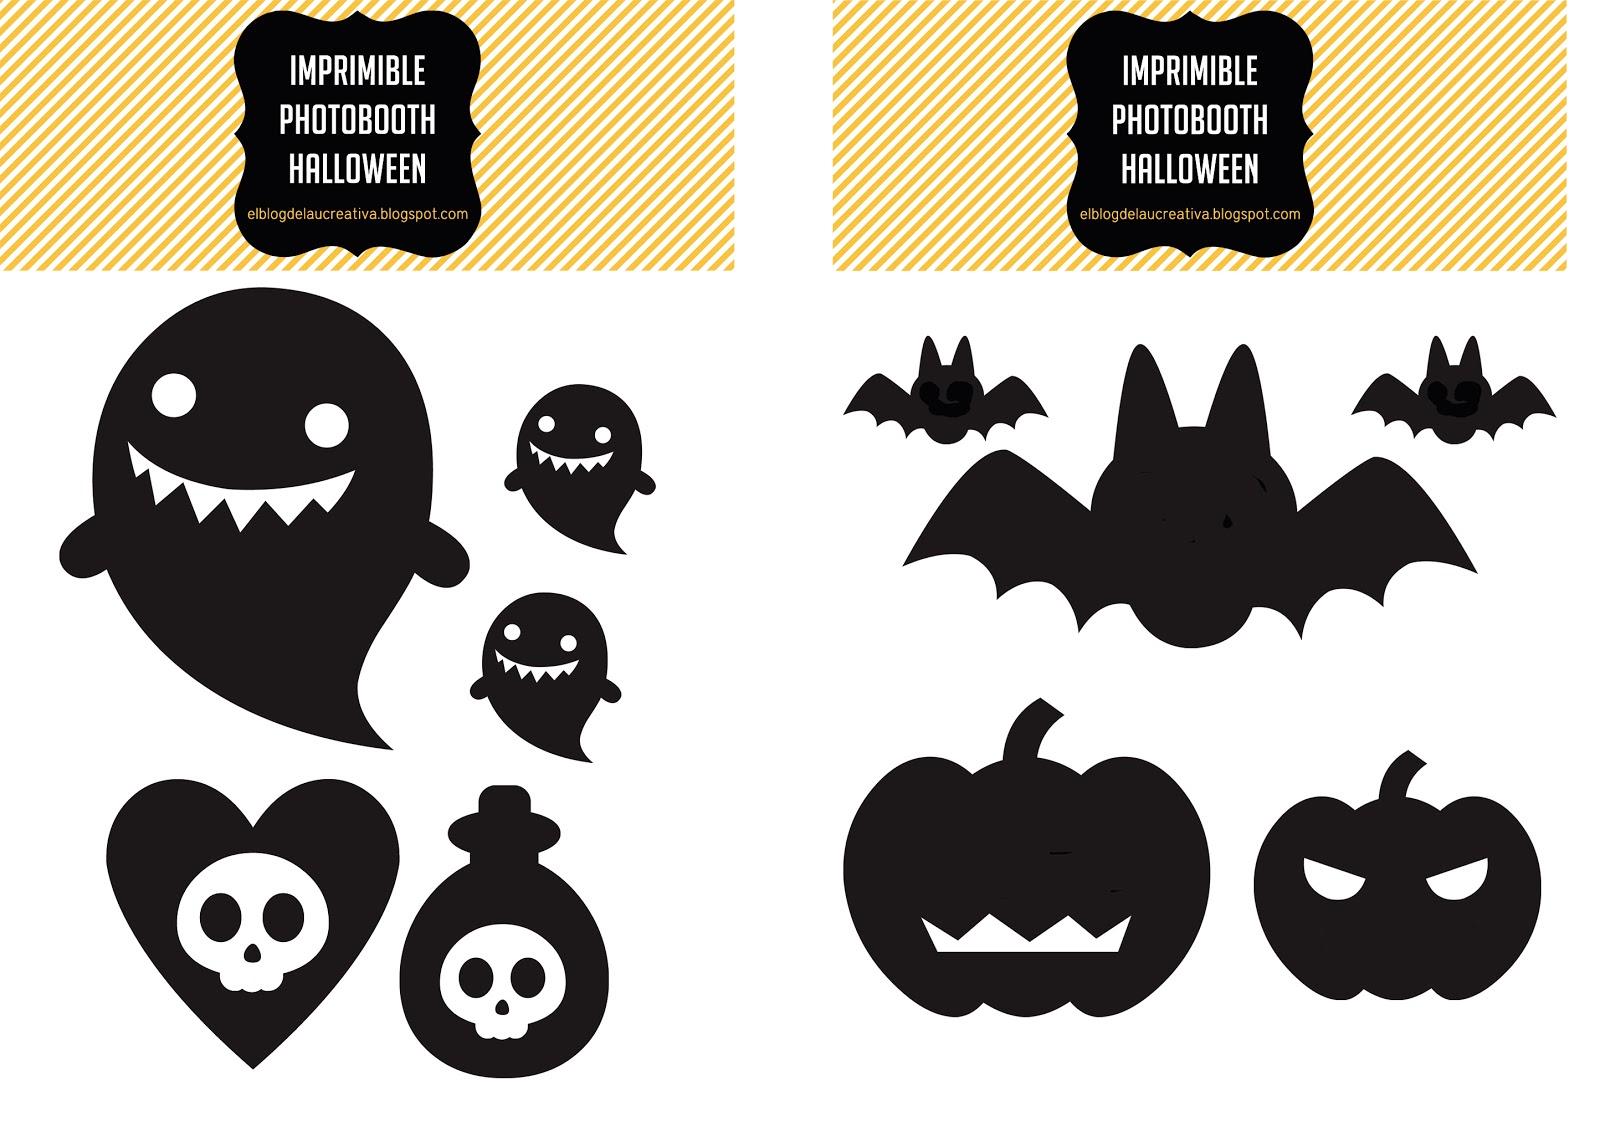 Desesperation manualidades decoracion halloween - Decoracion halloween para imprimir ...